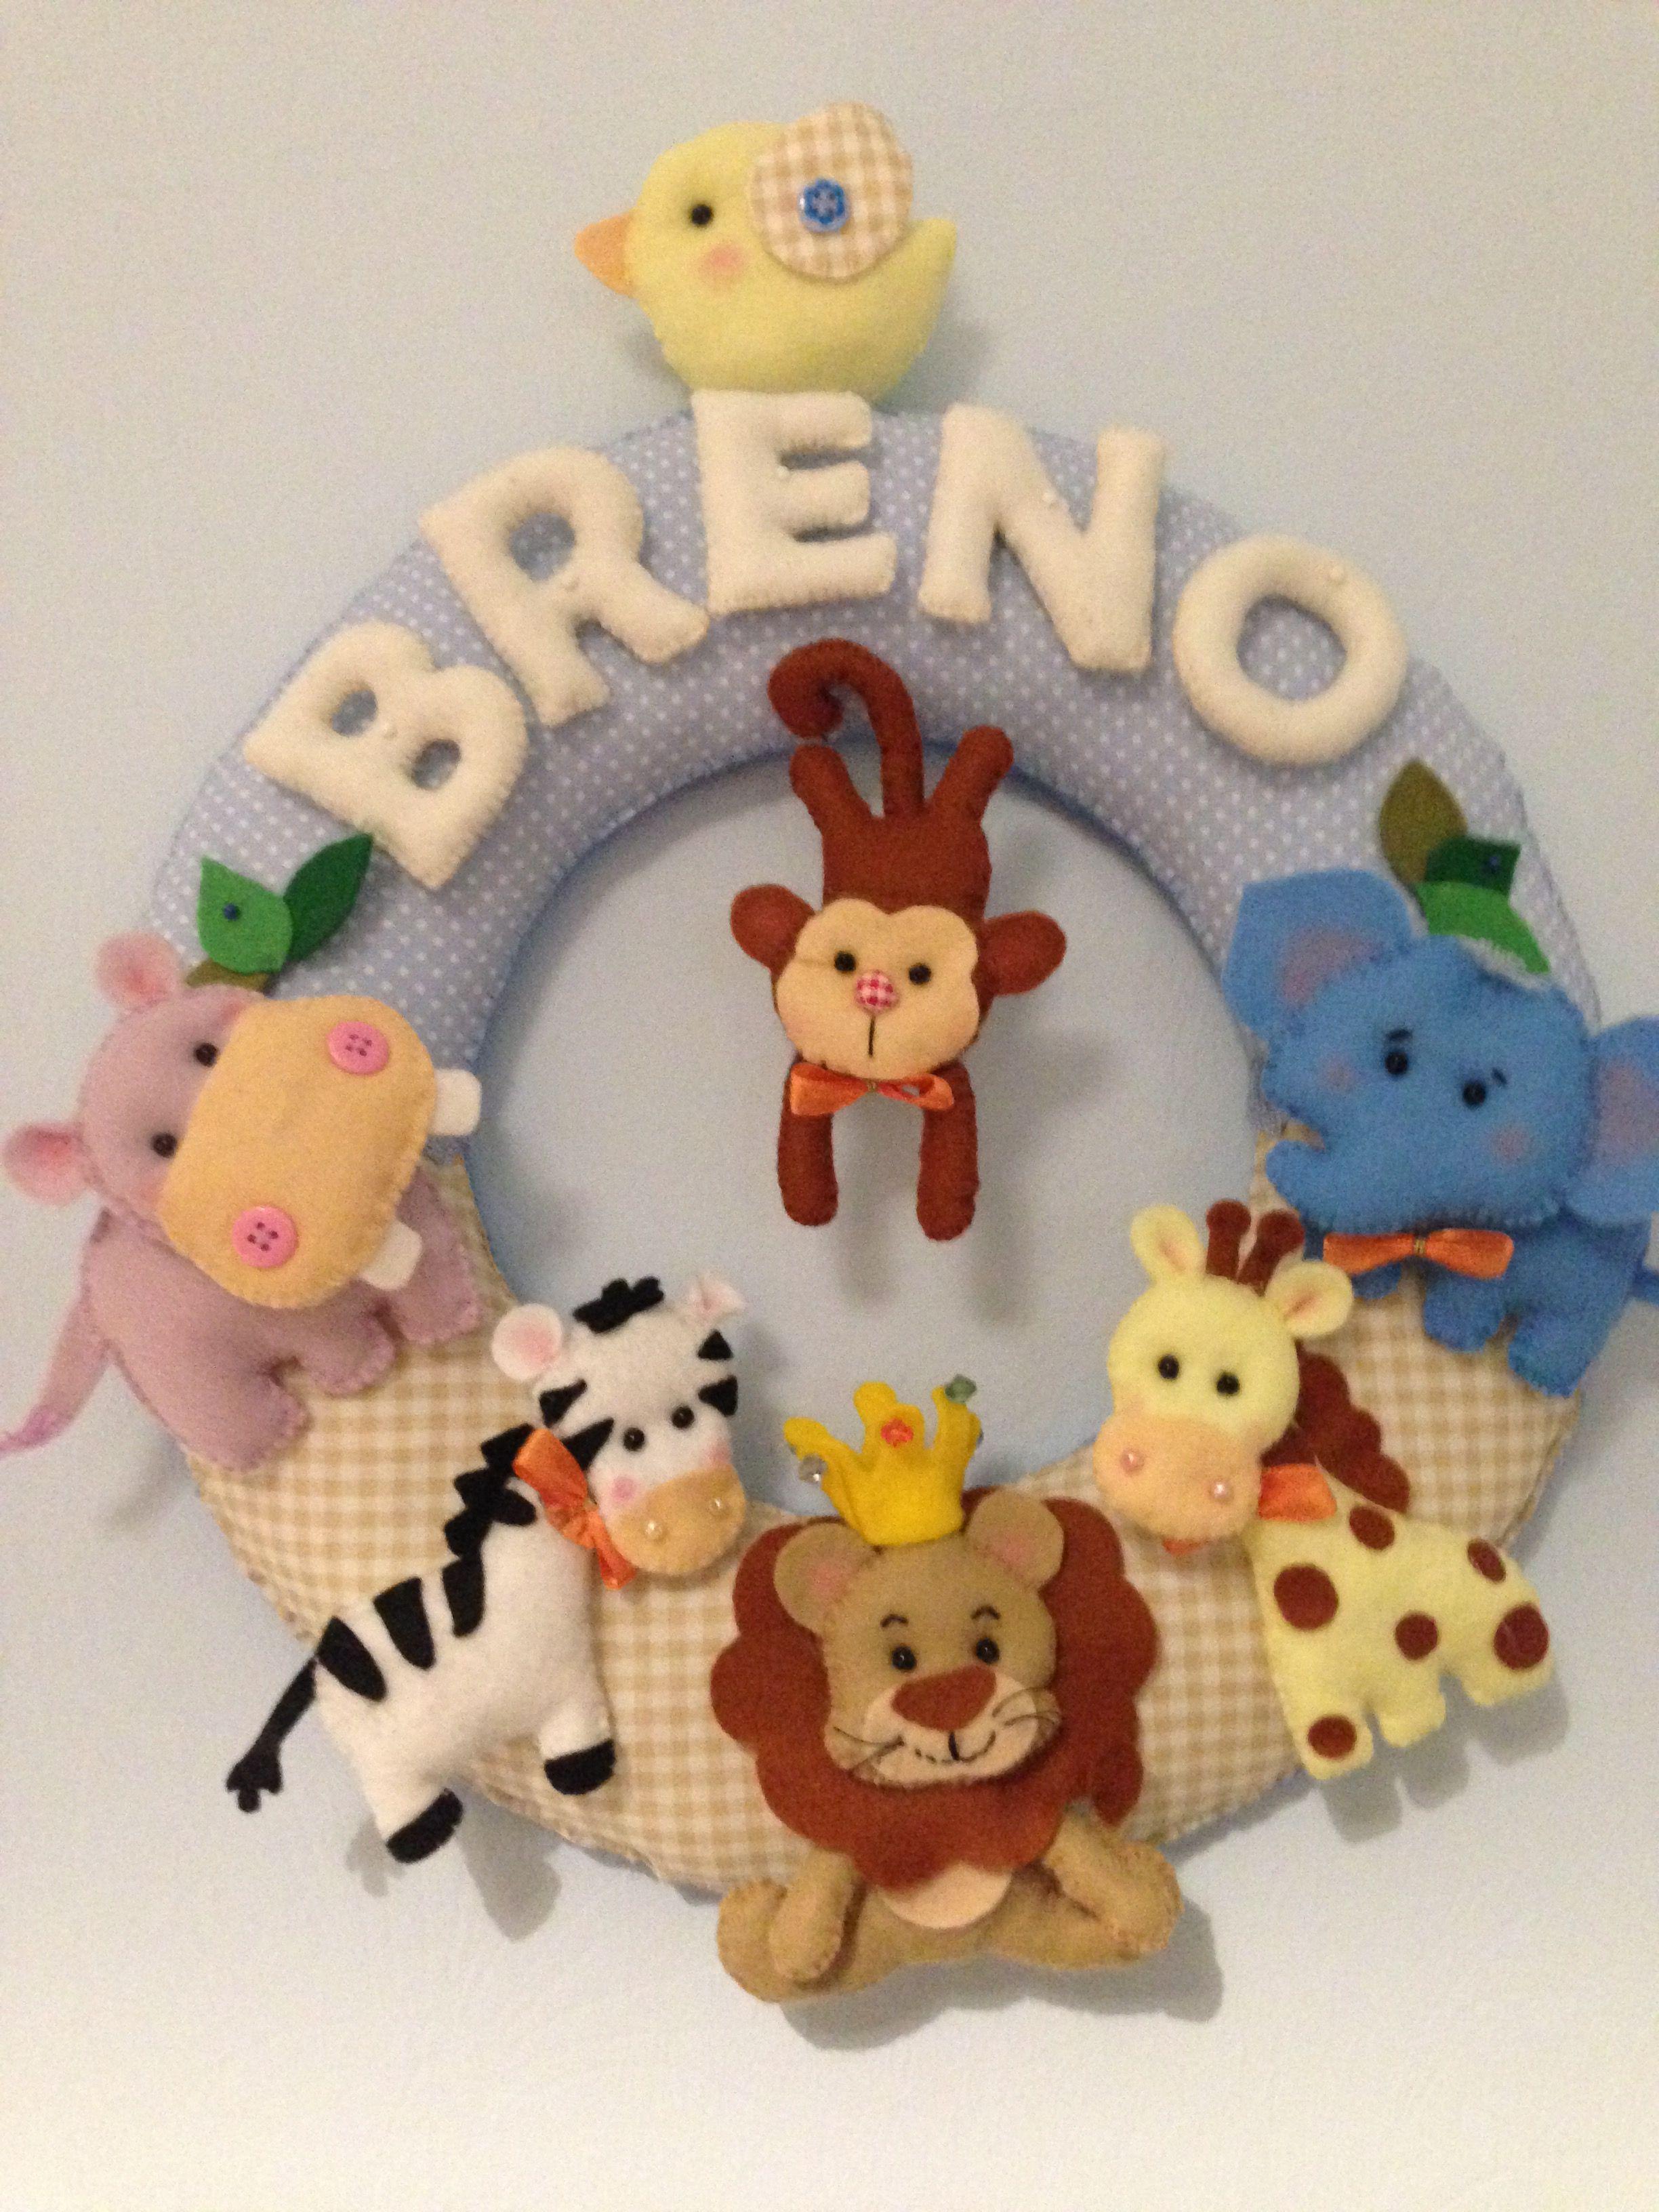 deko kinderzimmer babyzimmer safari Decorações de